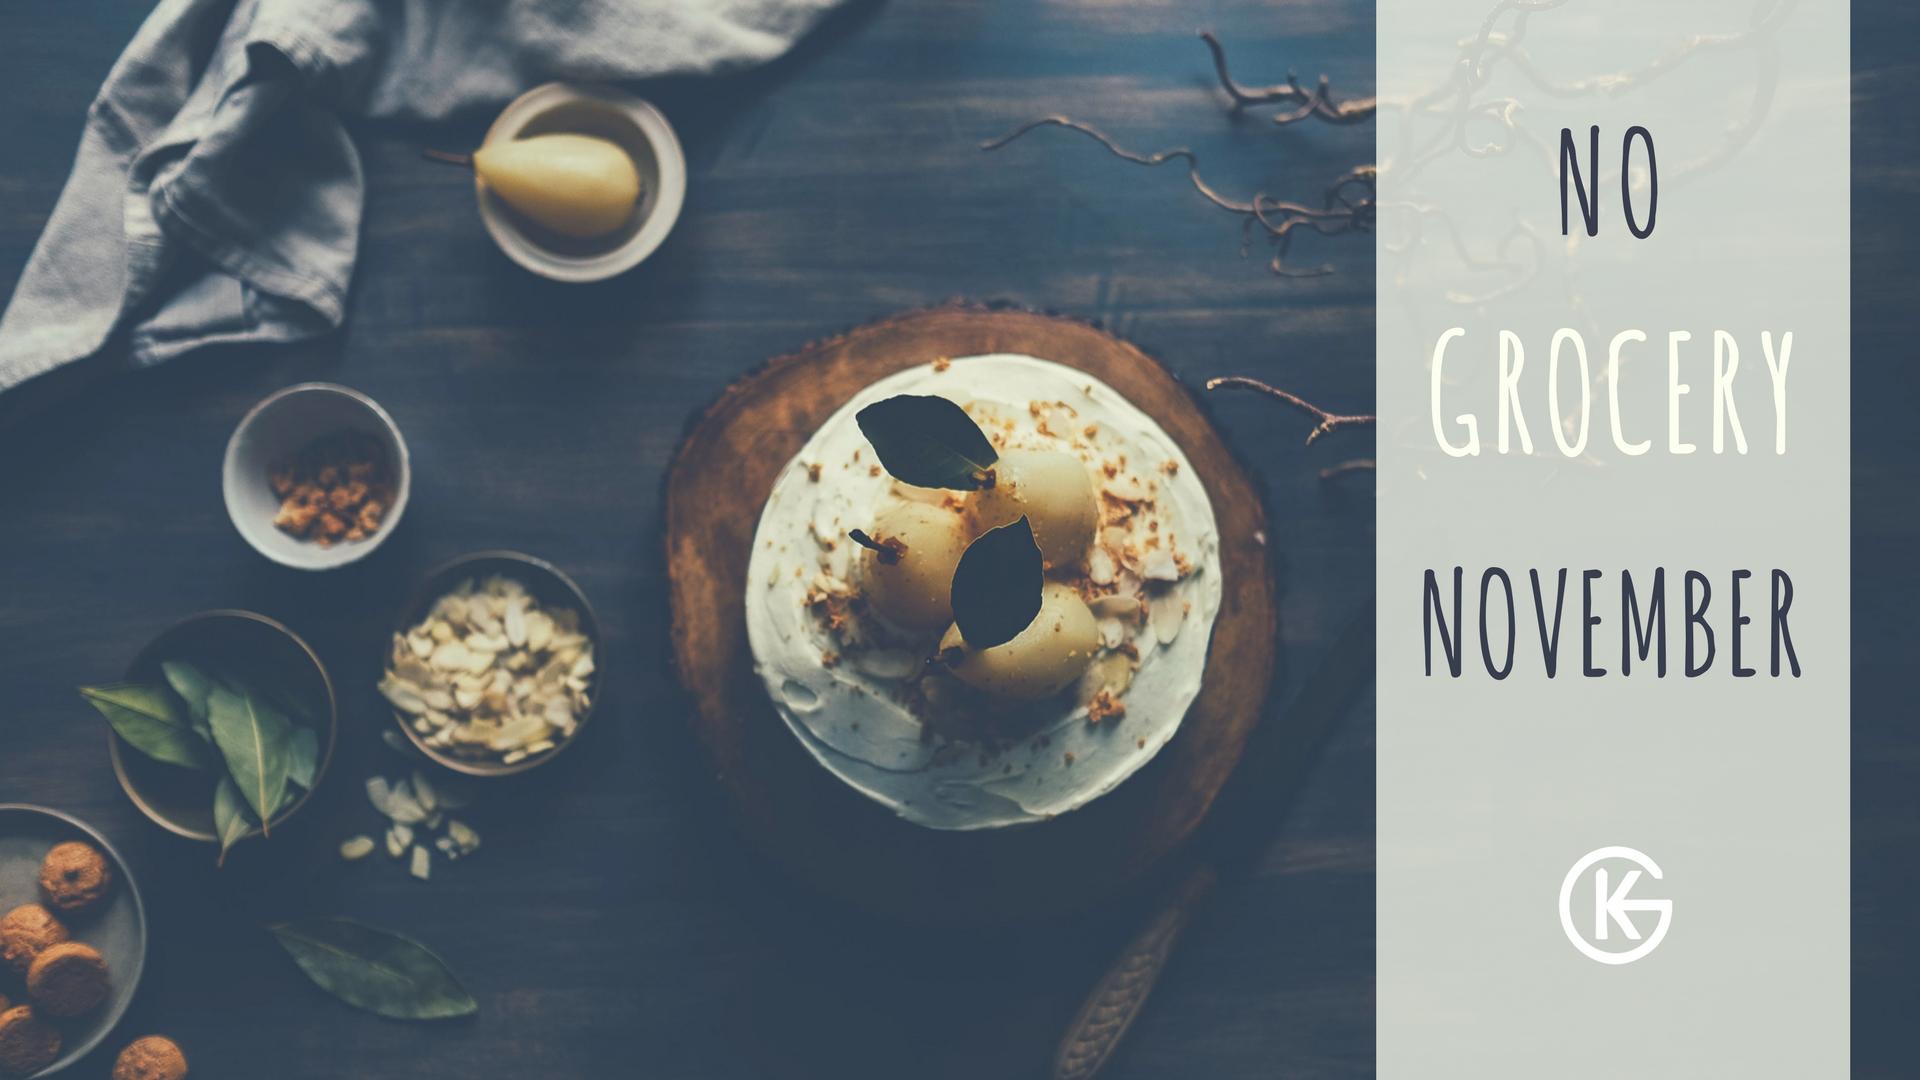 No Grocery November